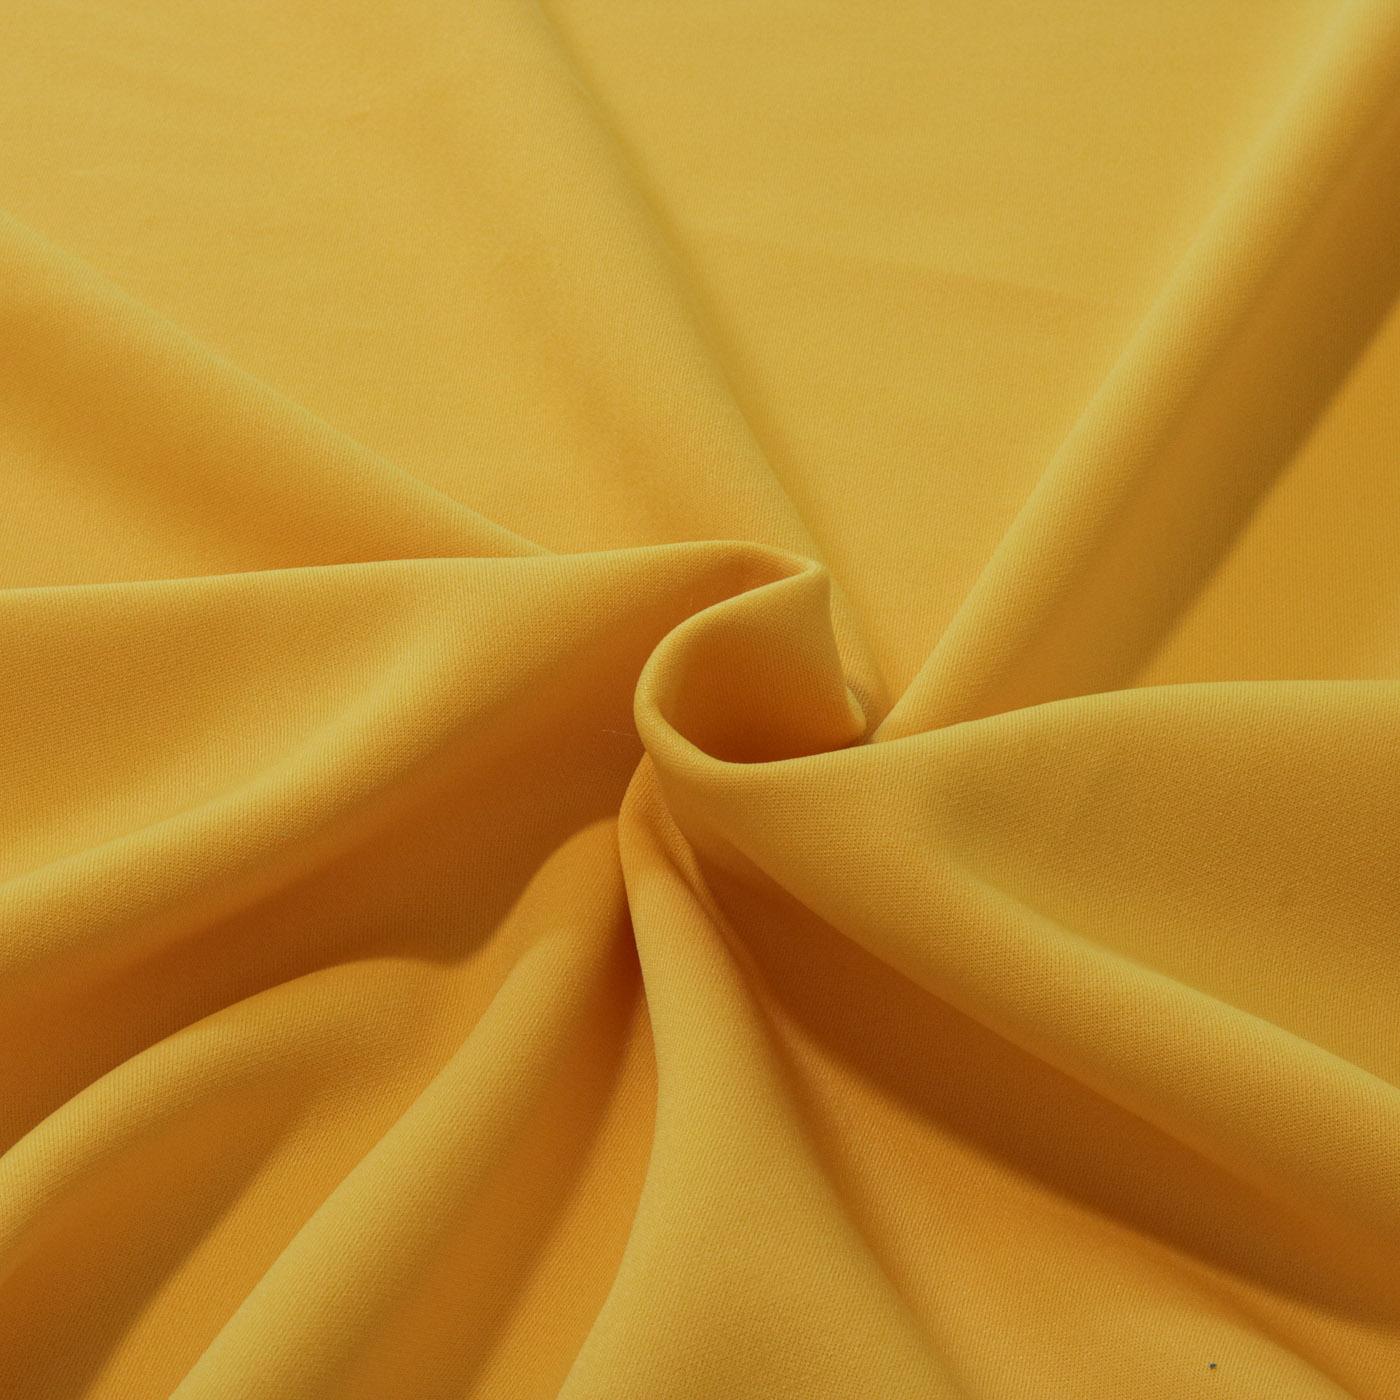 Tecido Malha Neoprene 1,60 m Largura Amarelo Canario